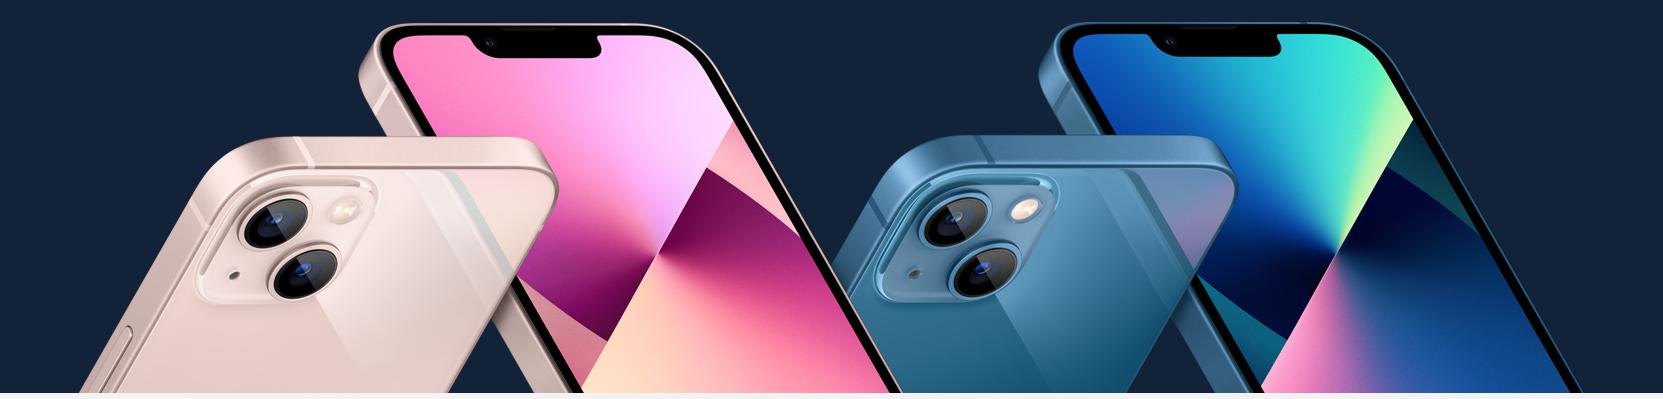 iPhone 13 Mini Pro Max Accessories